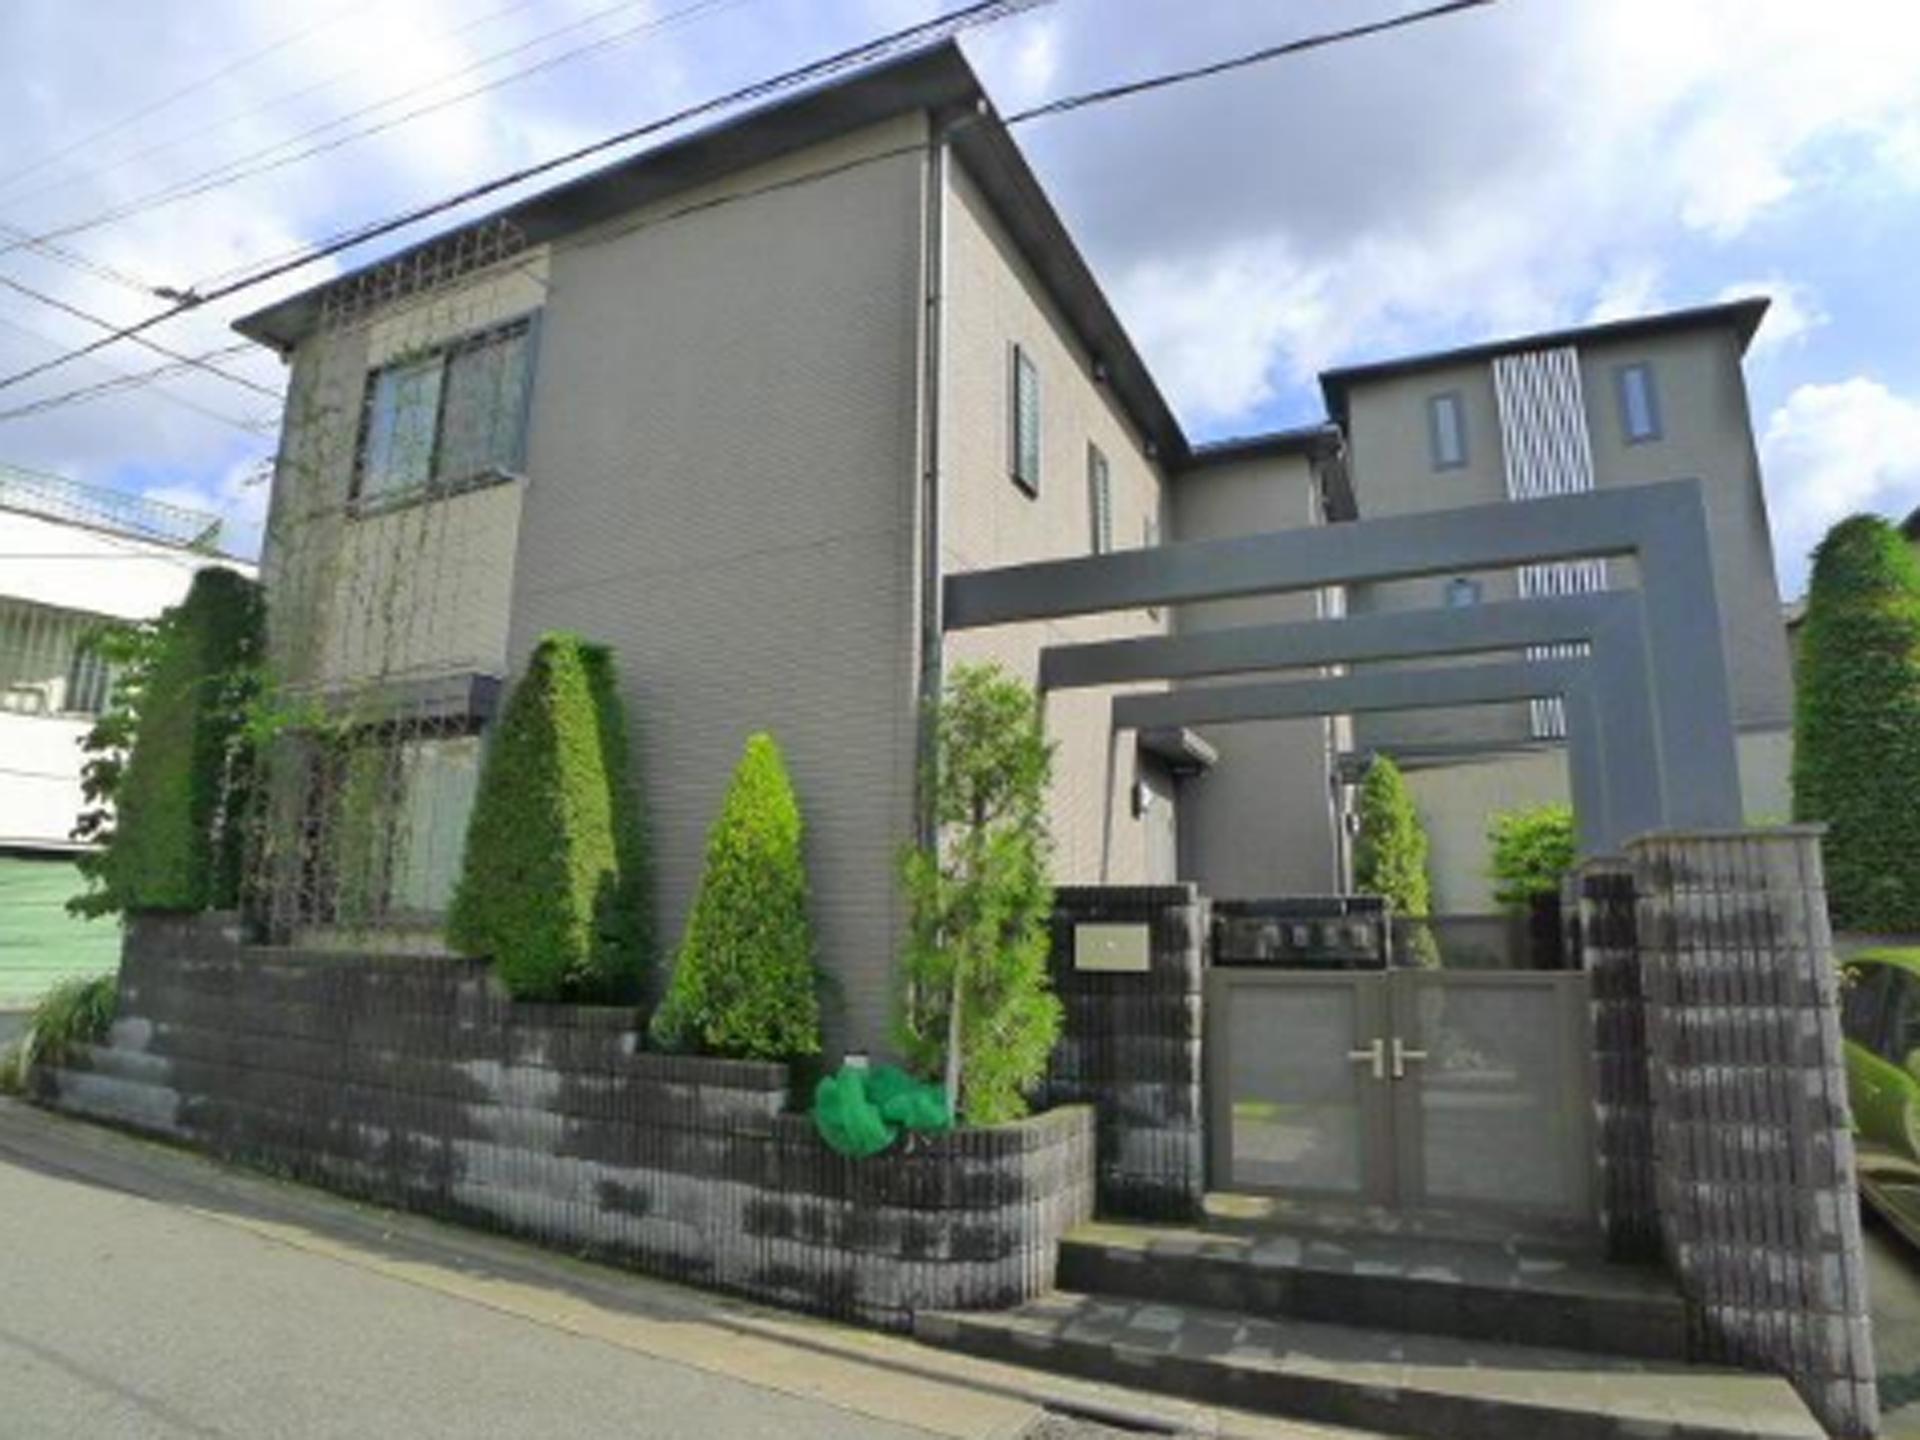 2ldk house daita setagaya ku tokyo japan for rent real